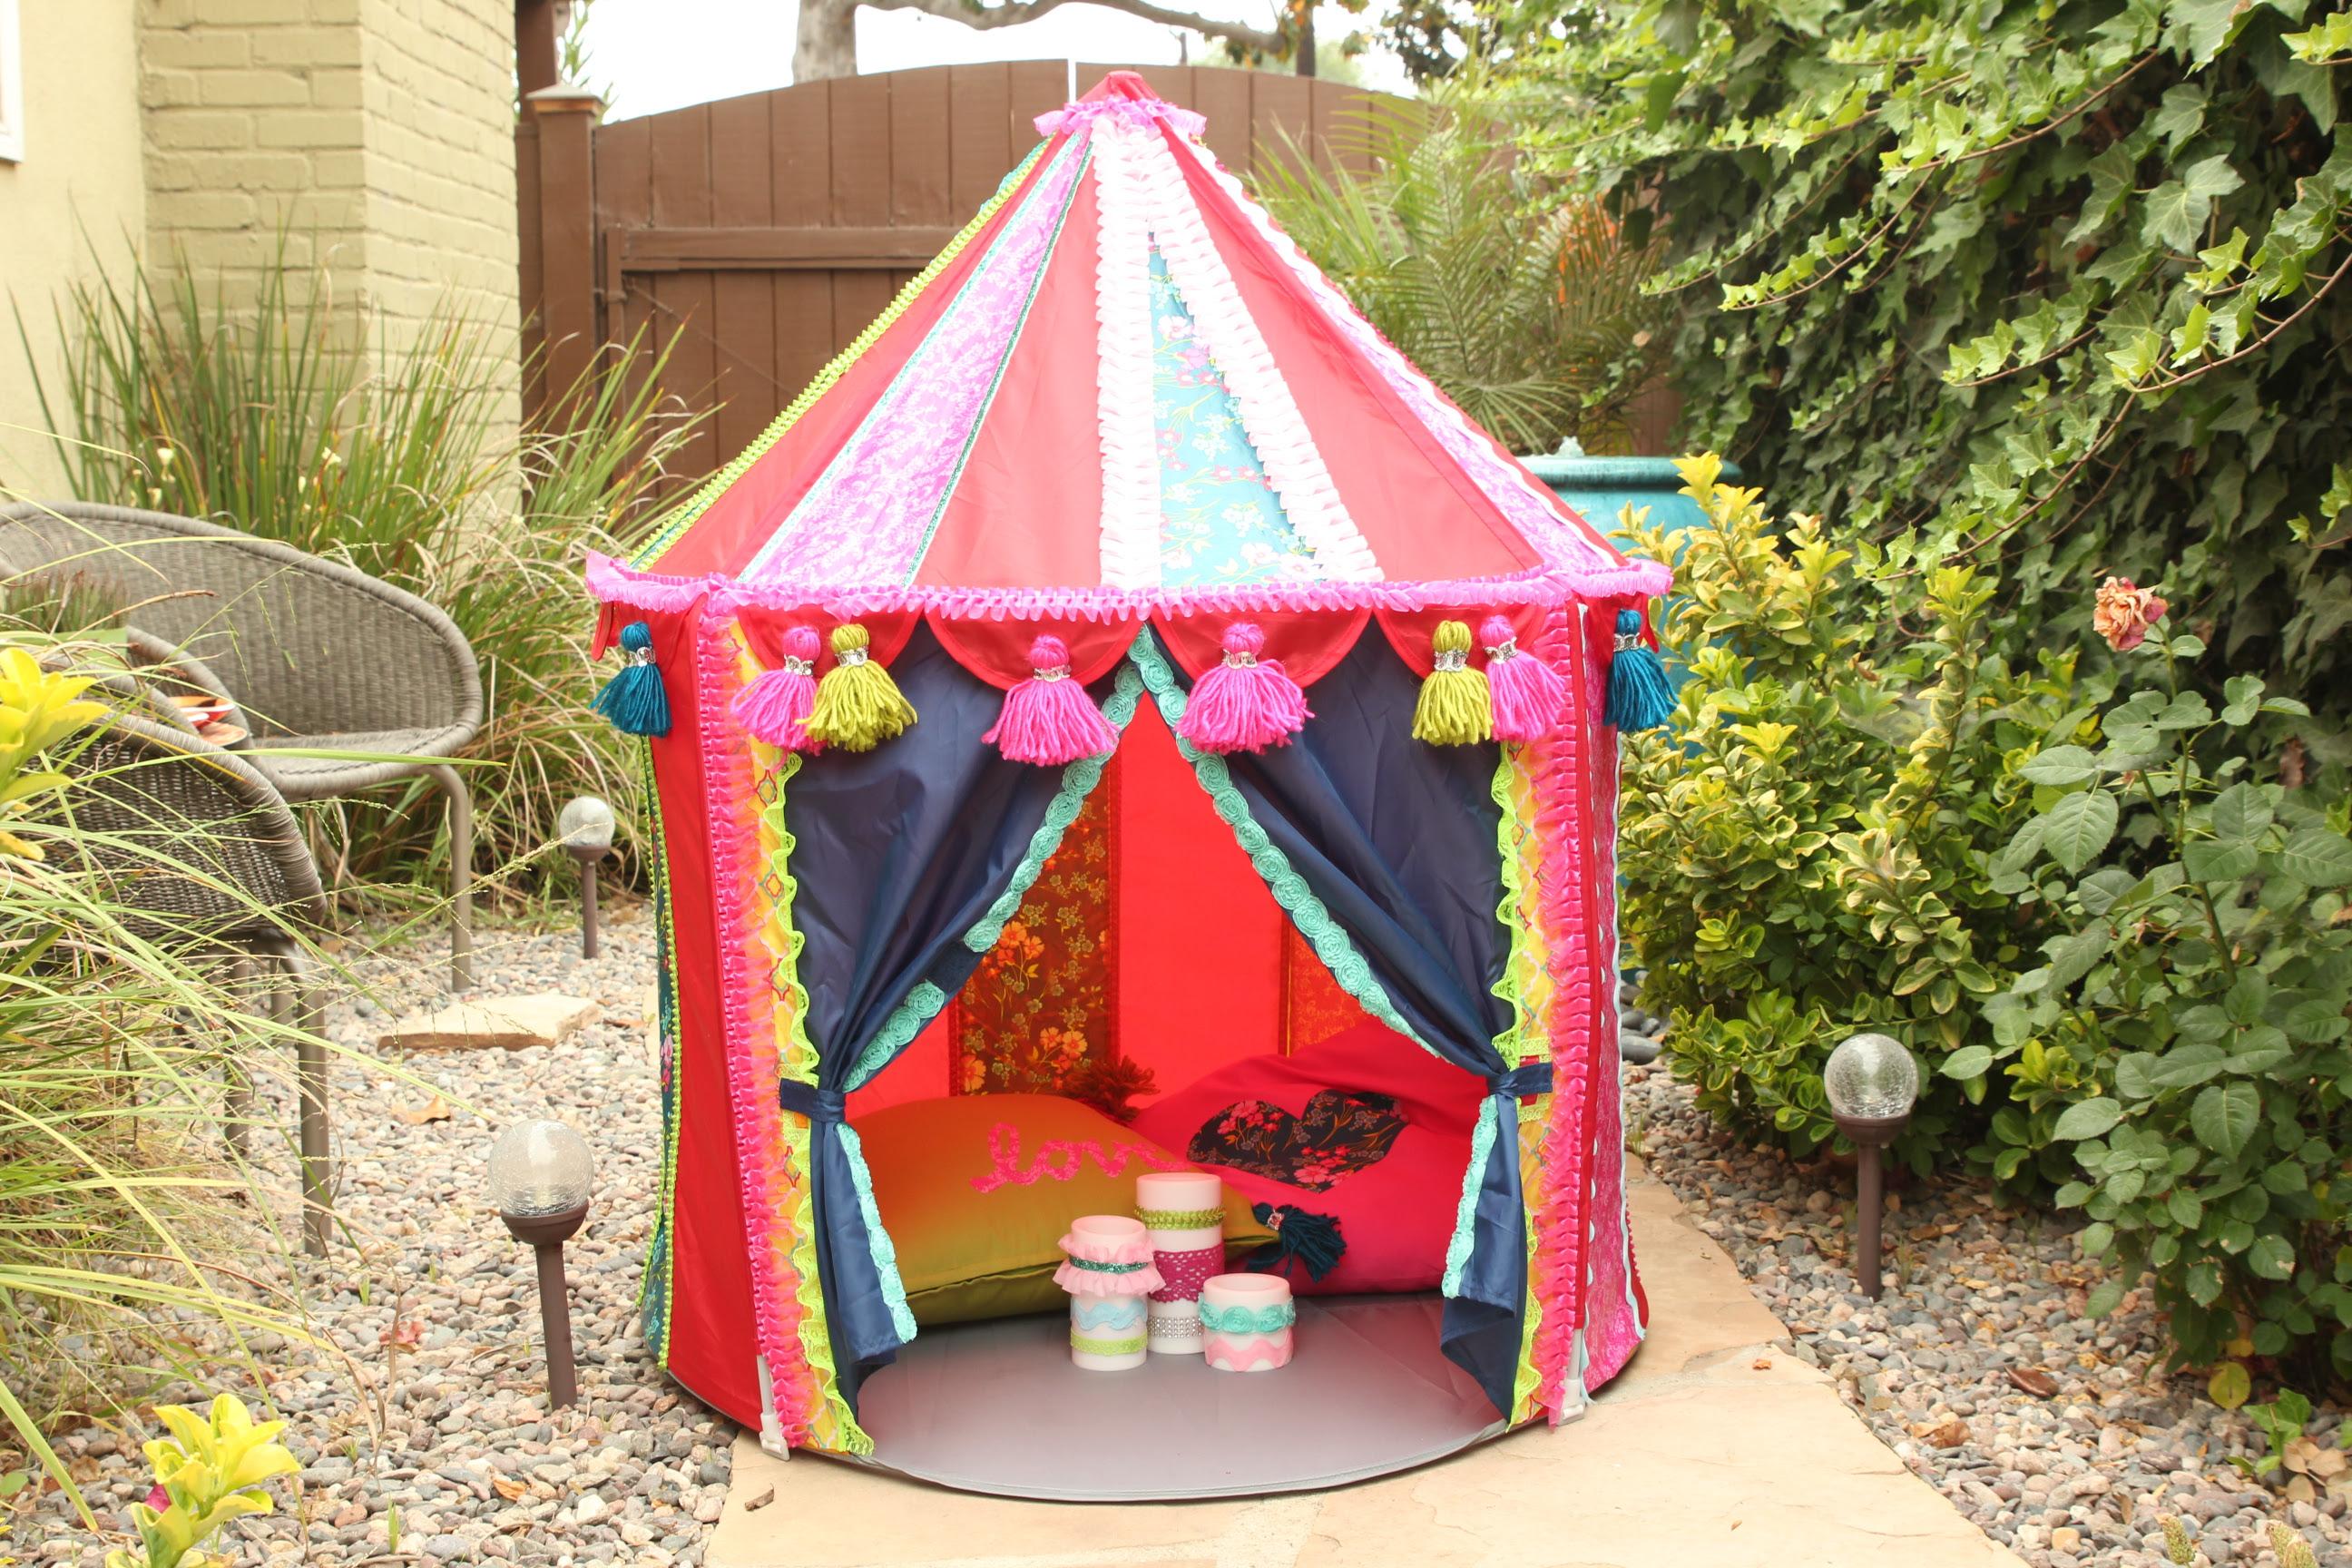 Ikea Hack! Make a Boho Play Tent from the CIRKUSTÄLT Tent ...